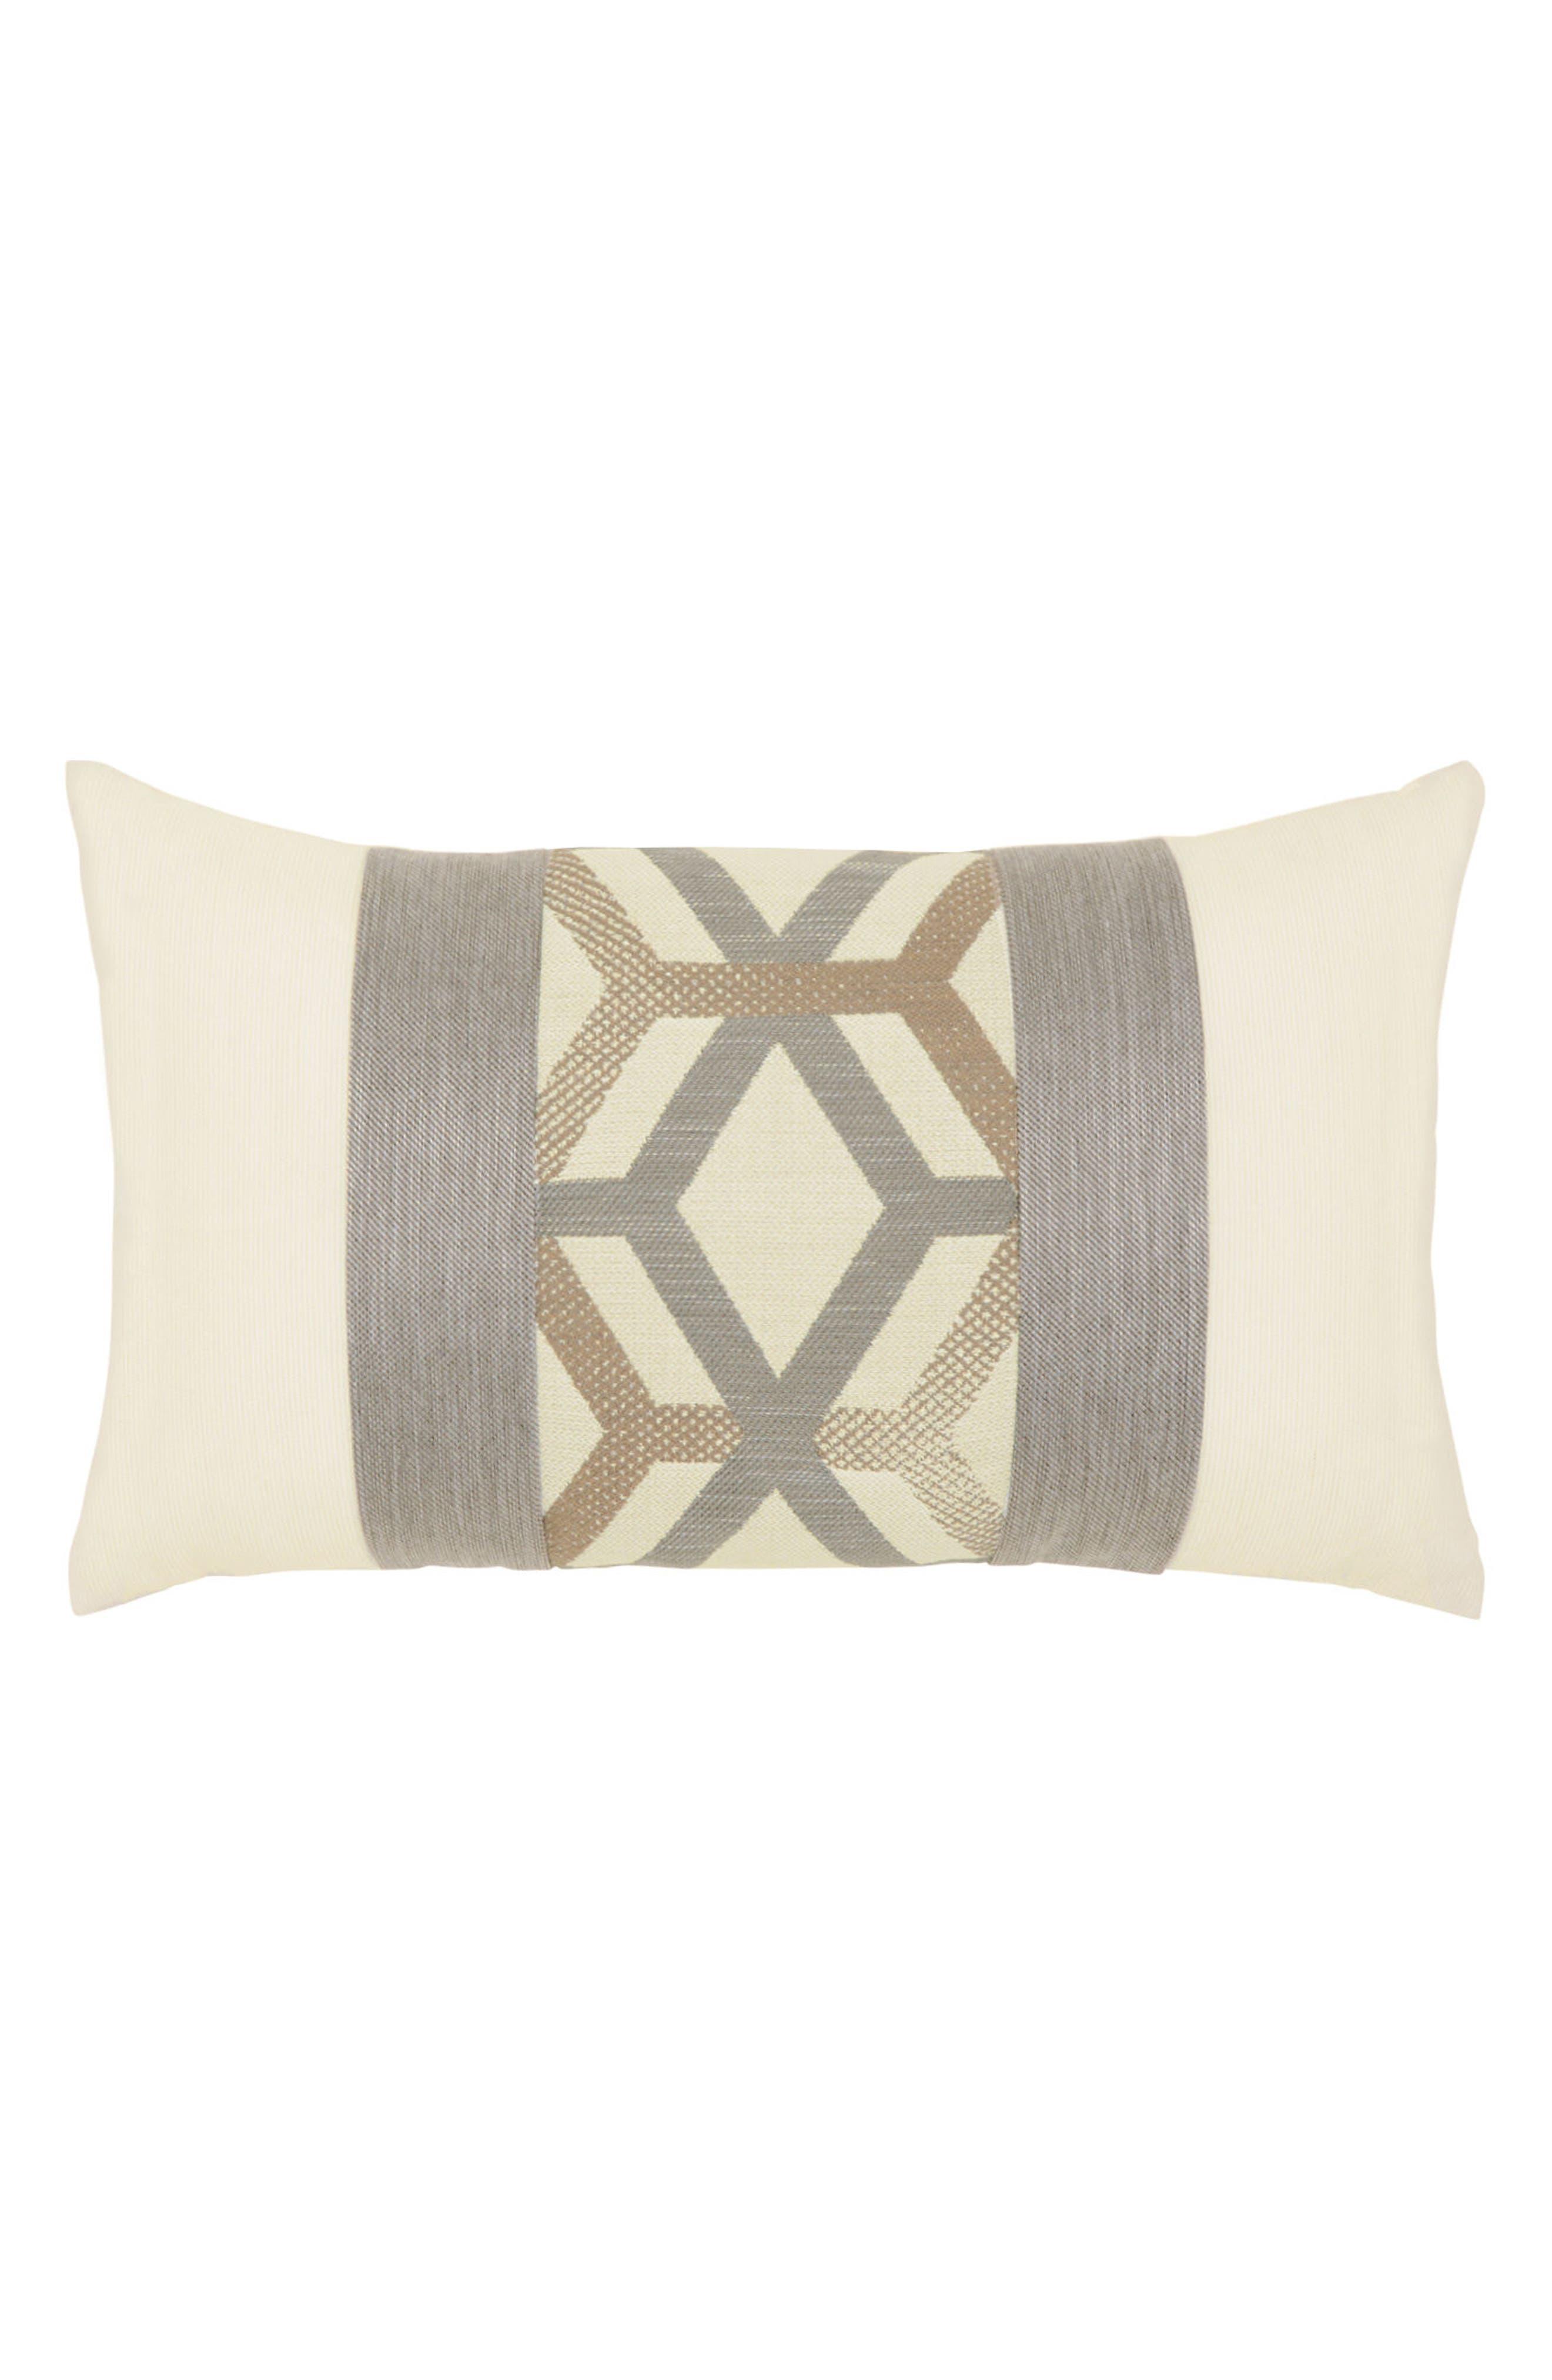 Elaine Smith Lustrous Lines Lumbar Pillow